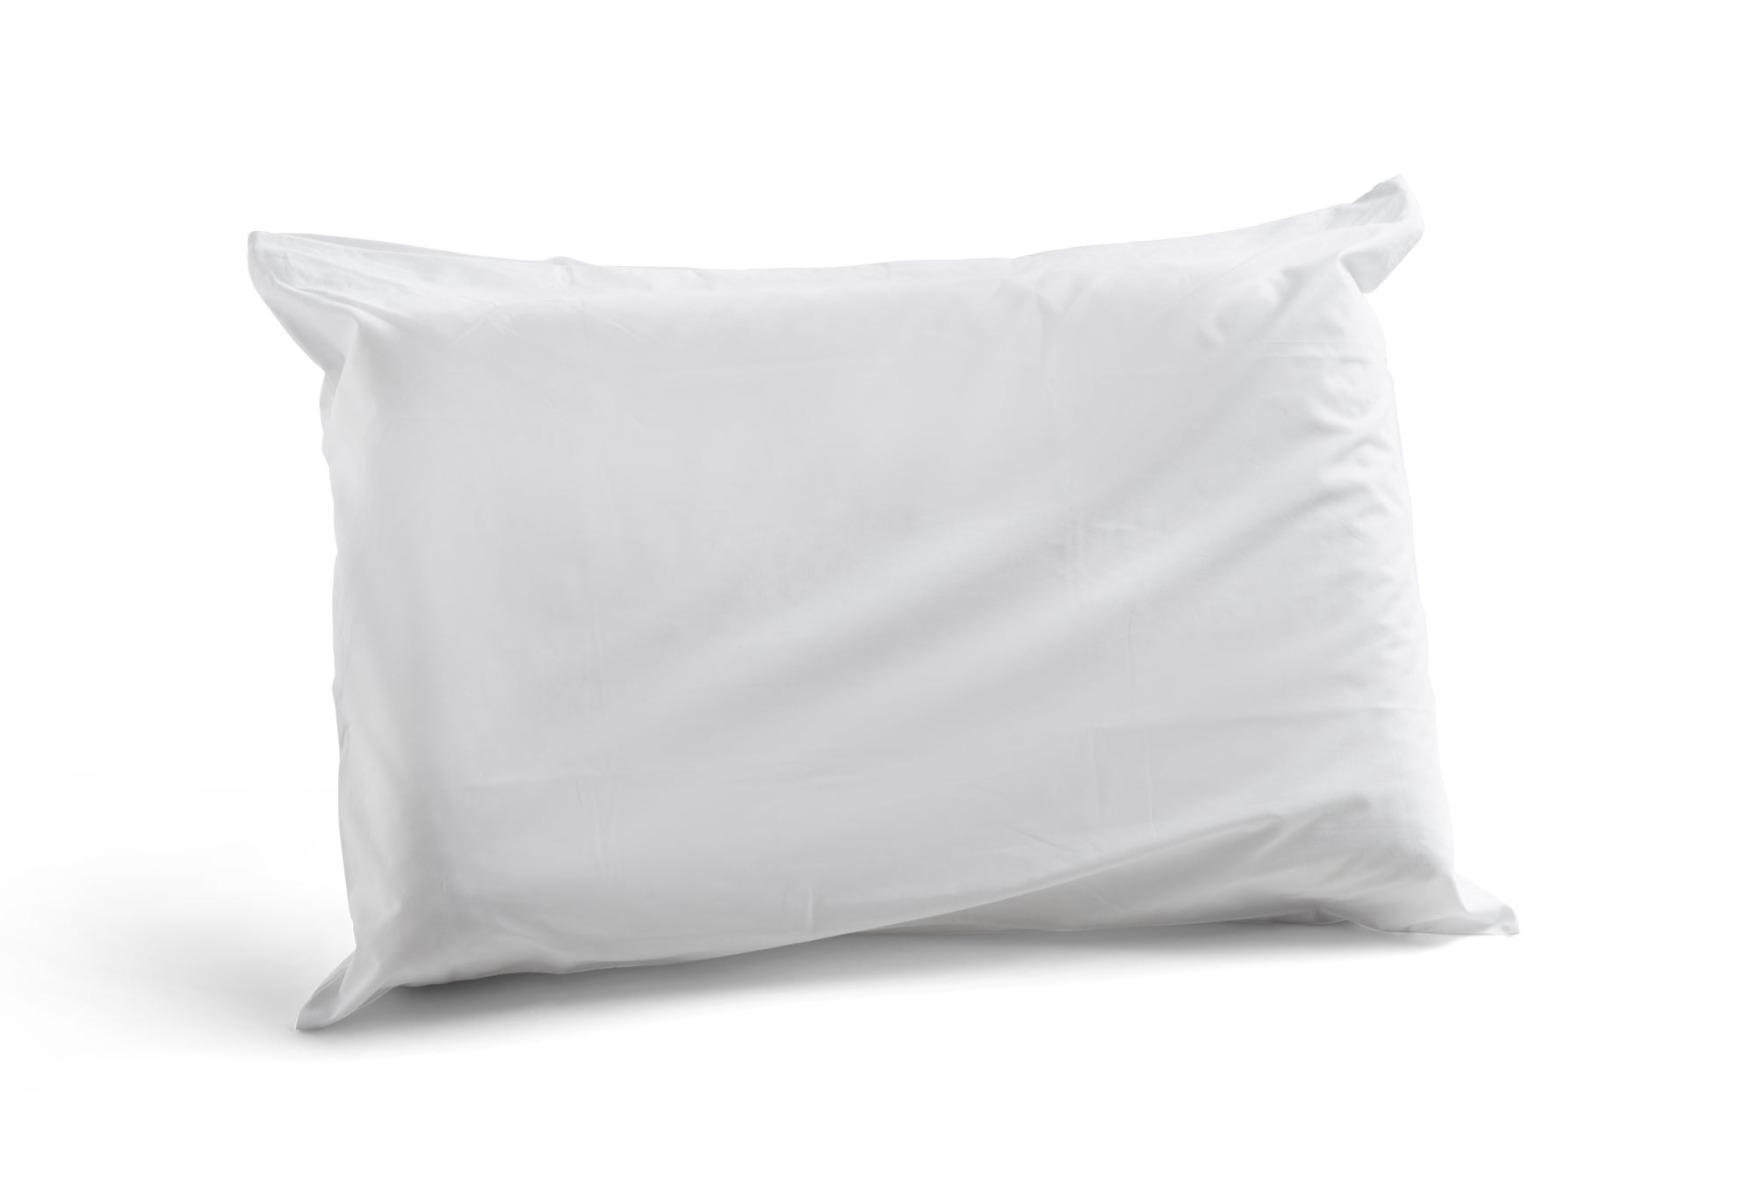 Dixxius Kussensloop Cotton Percal | Swiss Sense